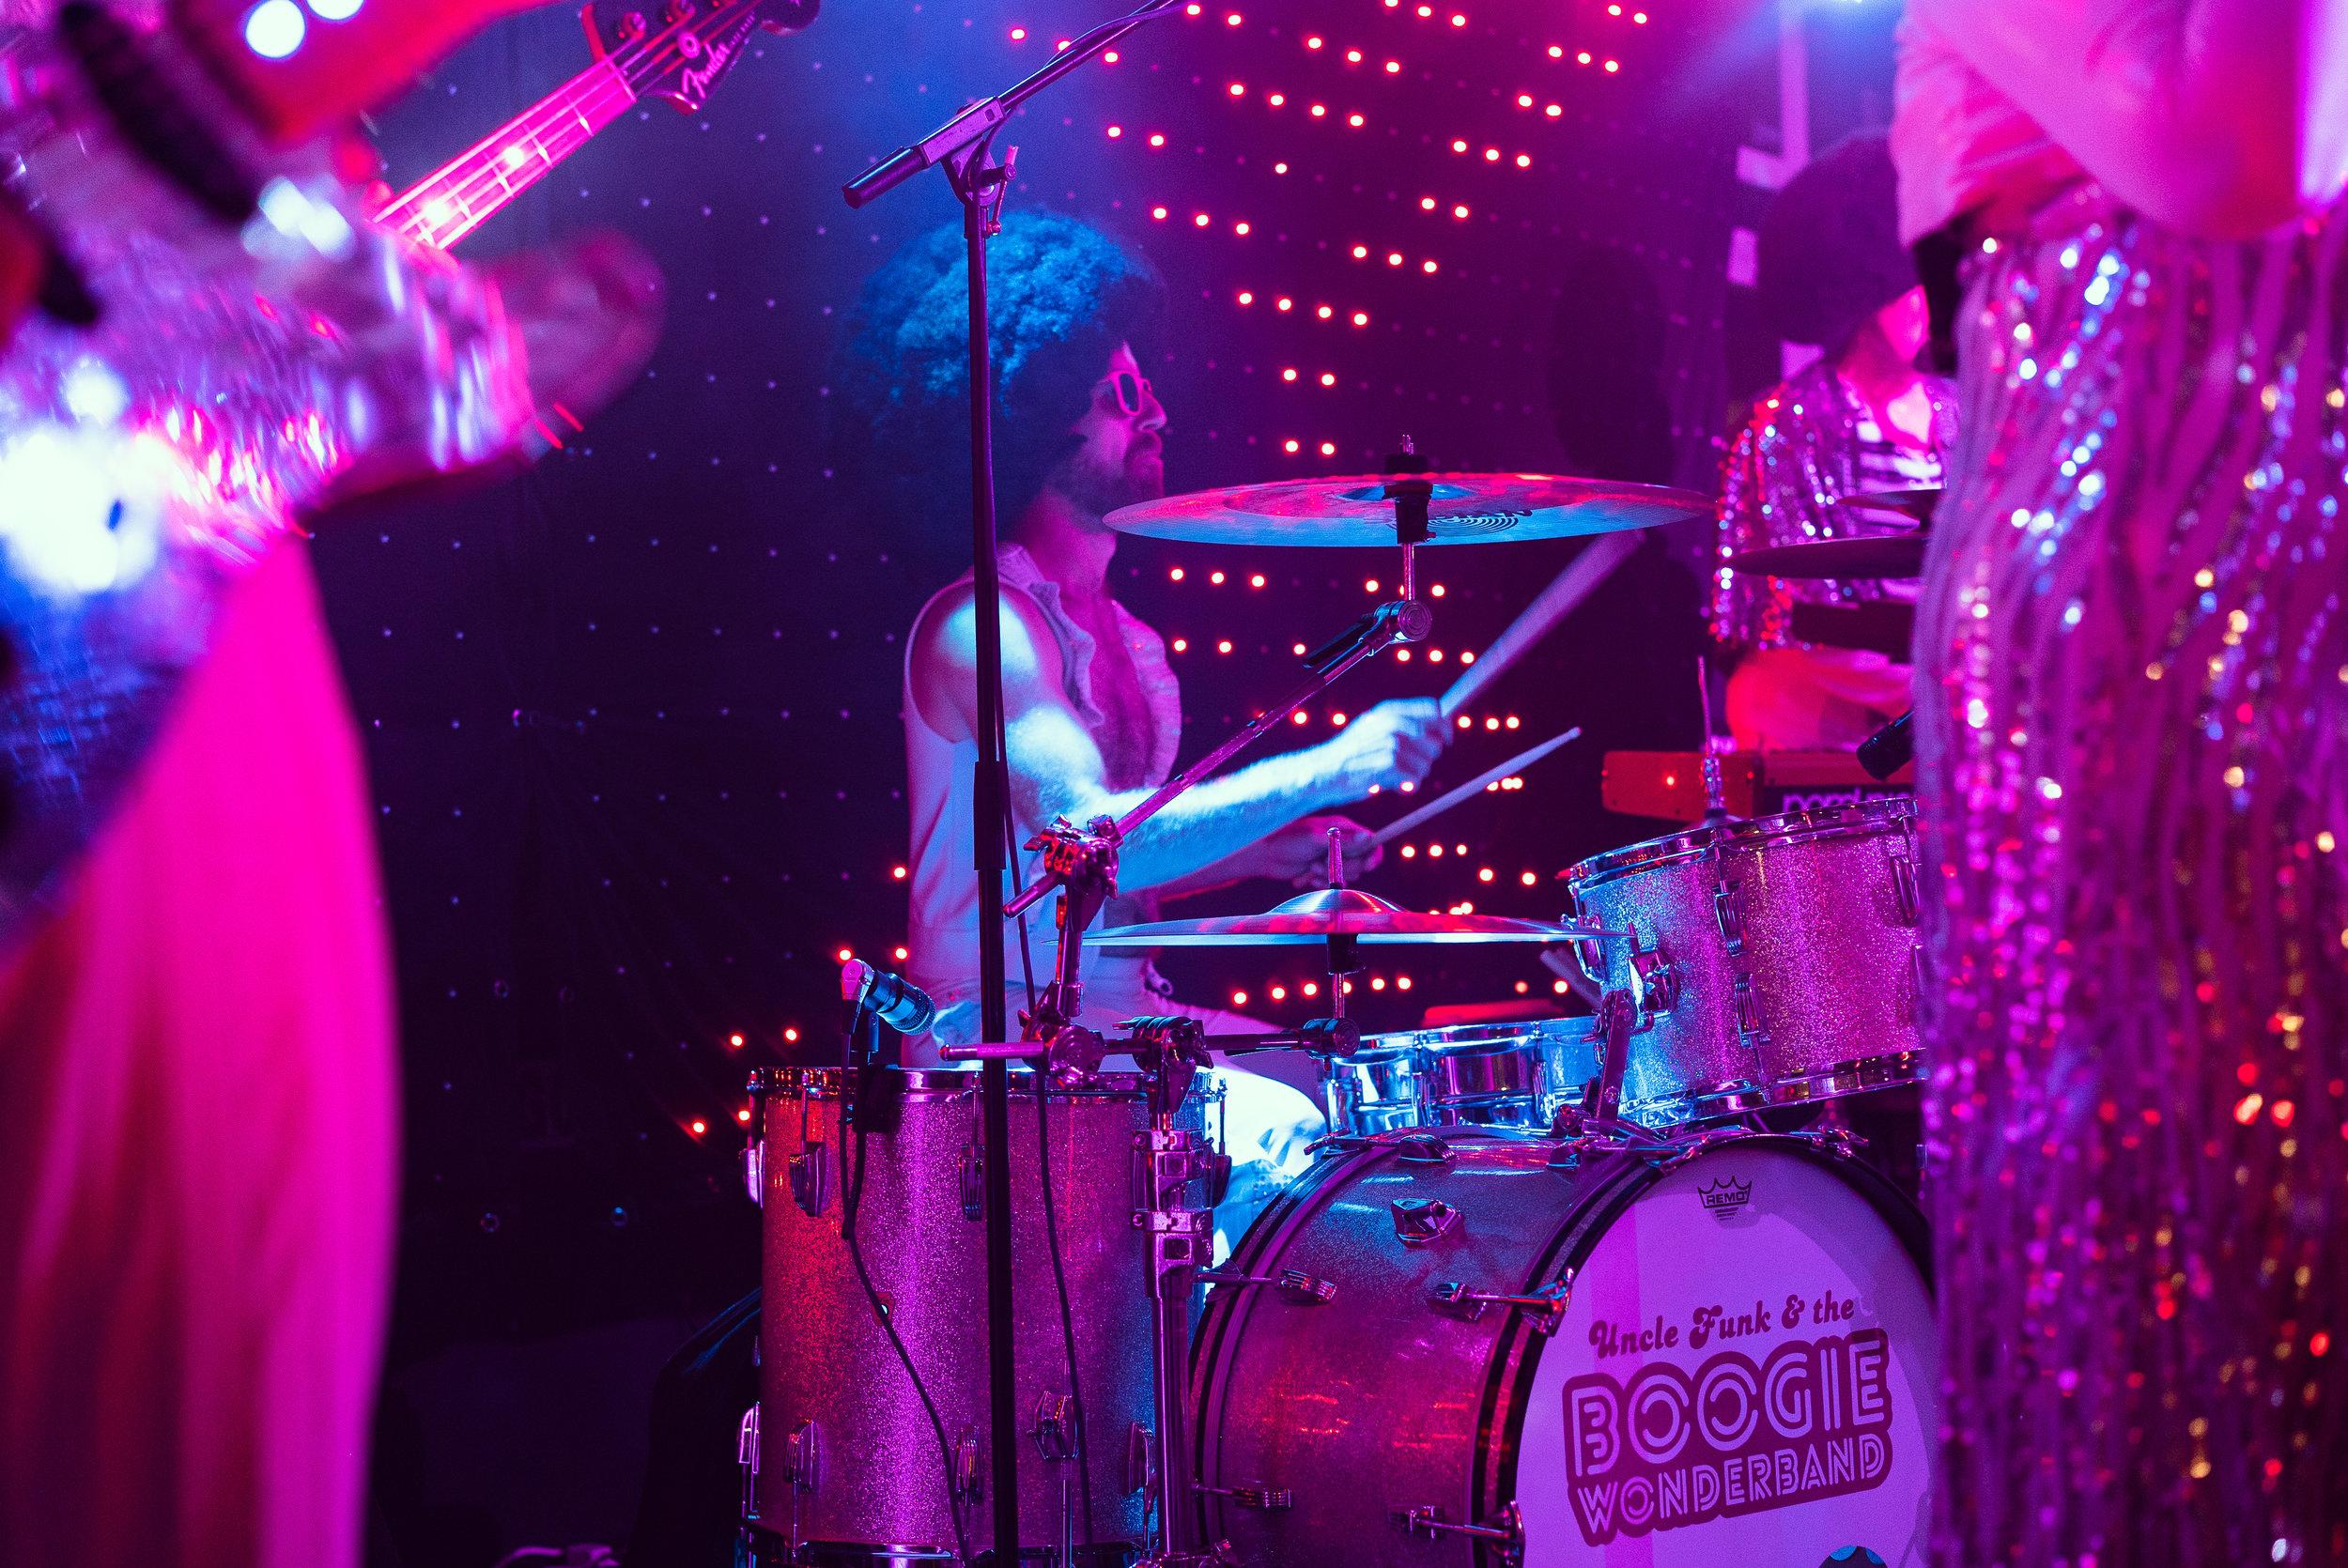 The Boogie Wonderband_s amazing drummer.jpg